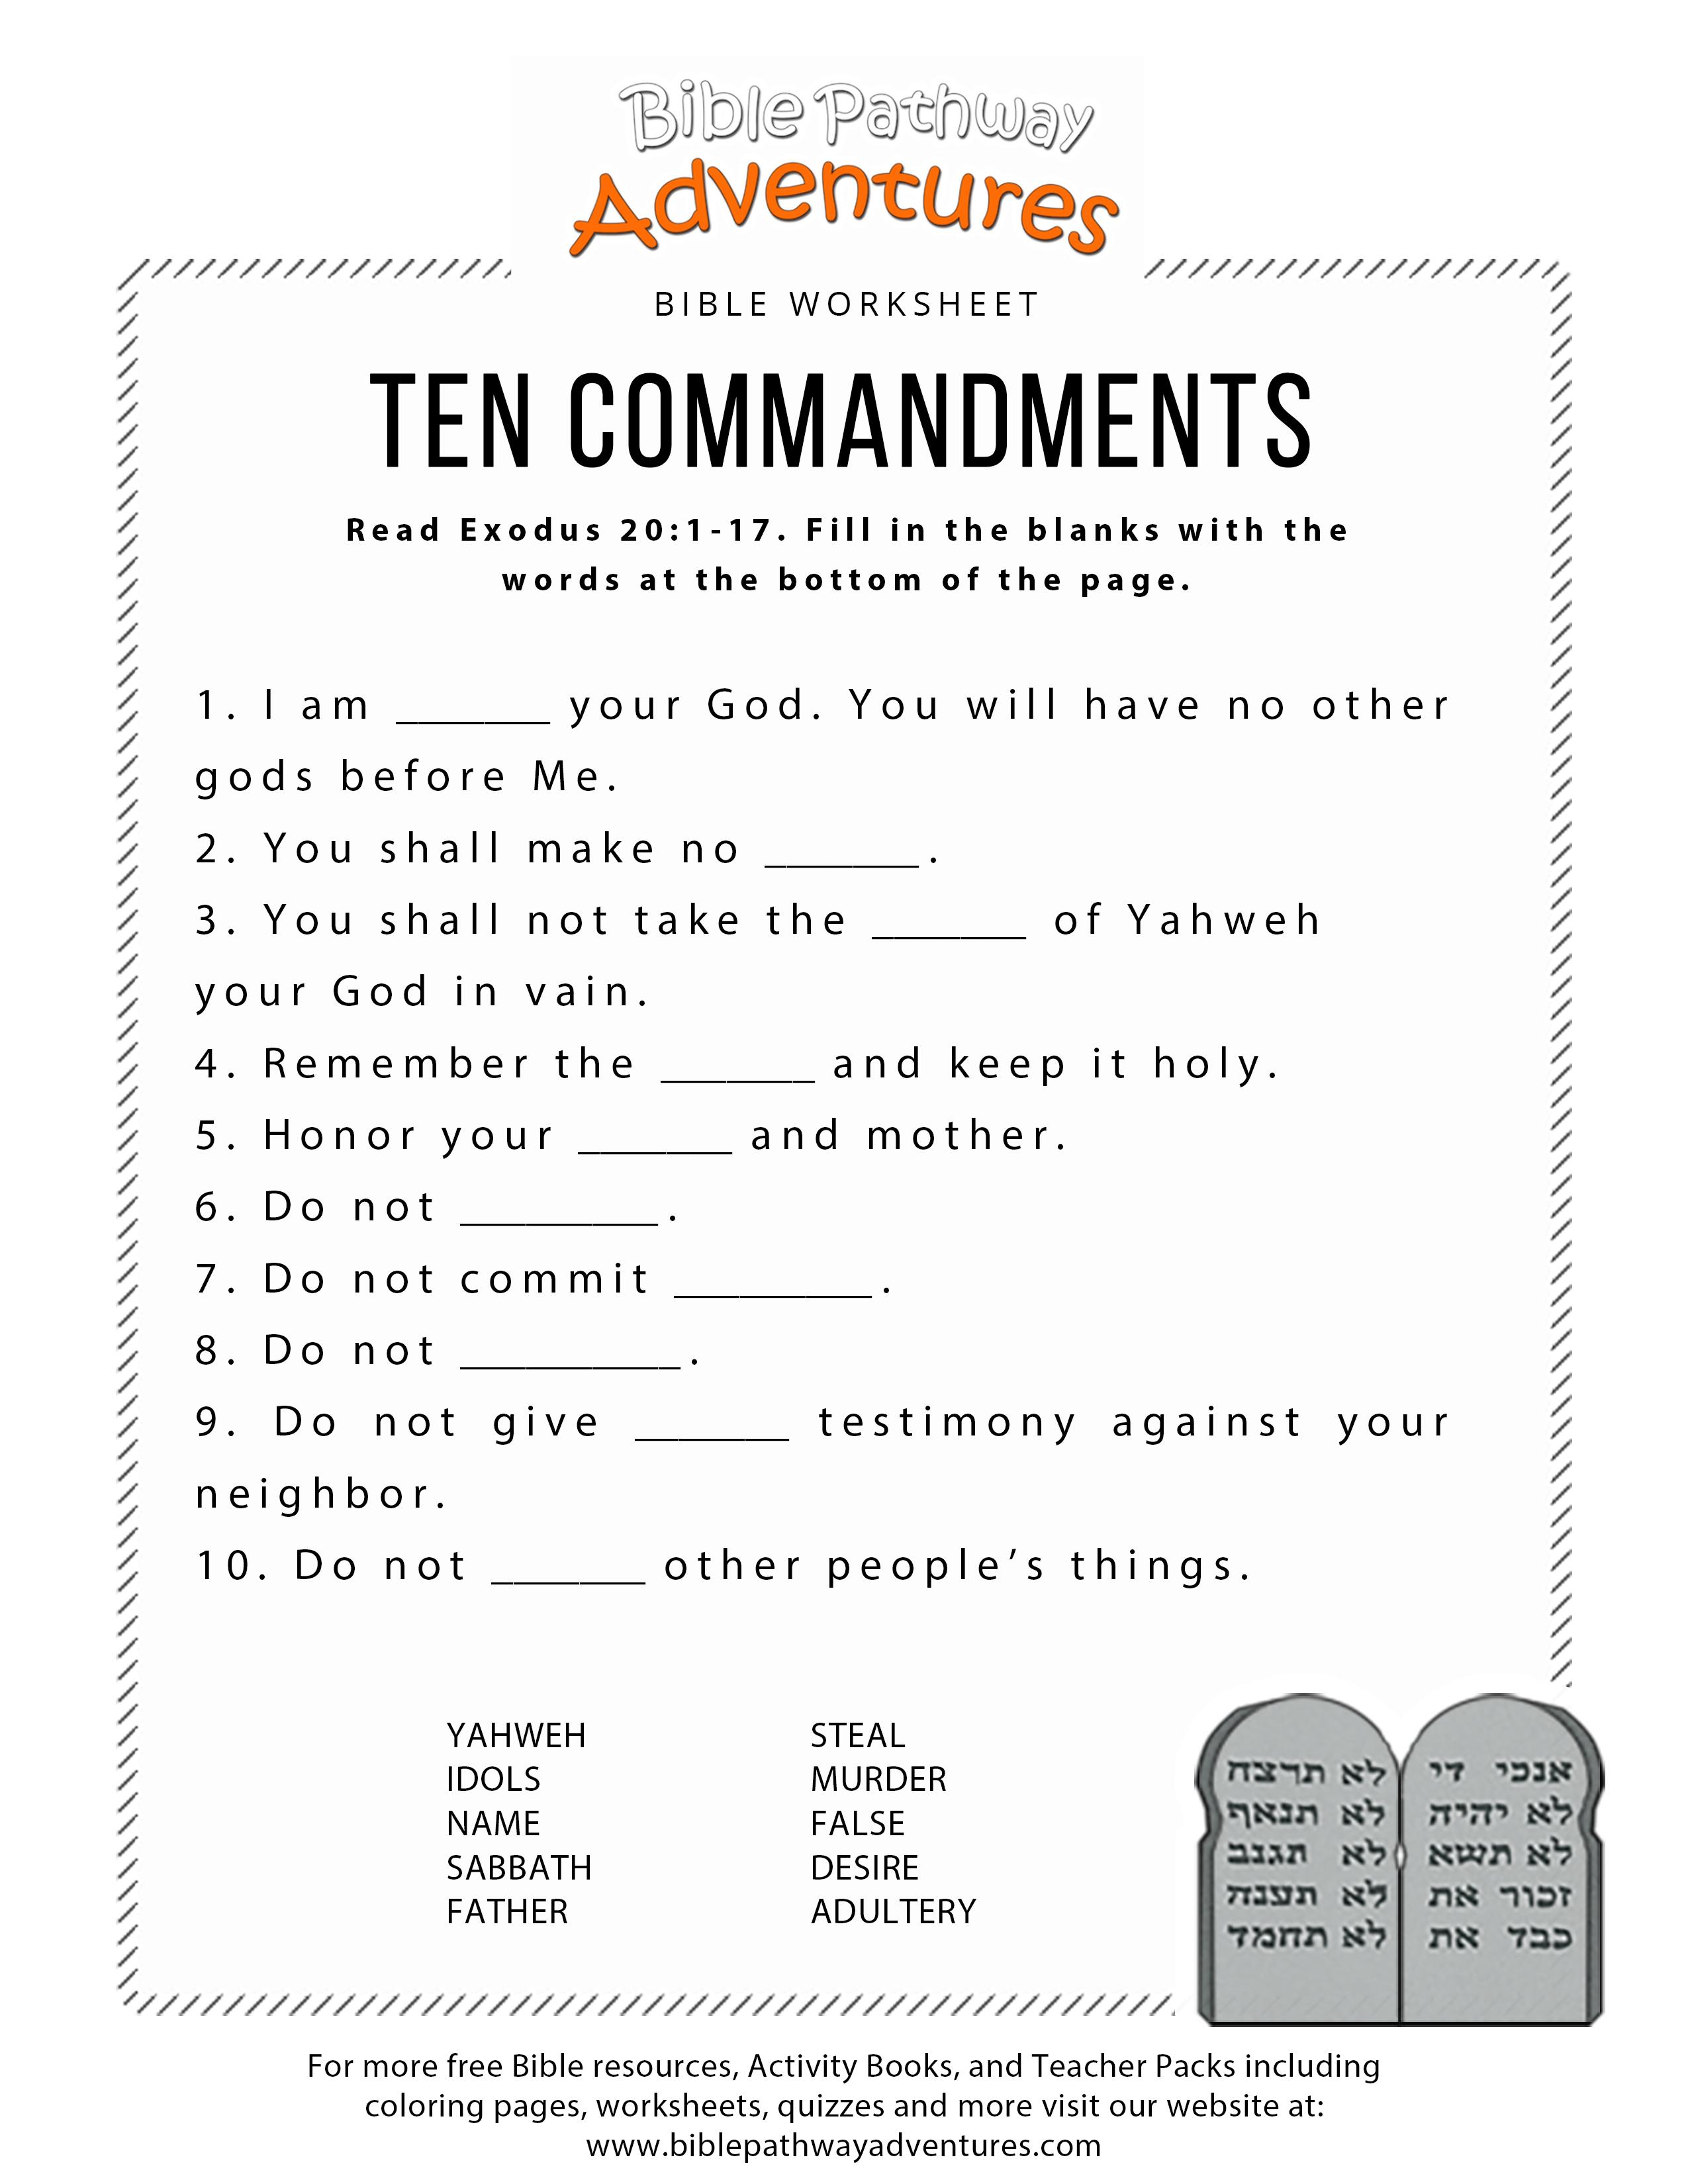 Ten Commandments Worksheet For Kids - Free Printable Bible Games For Kids